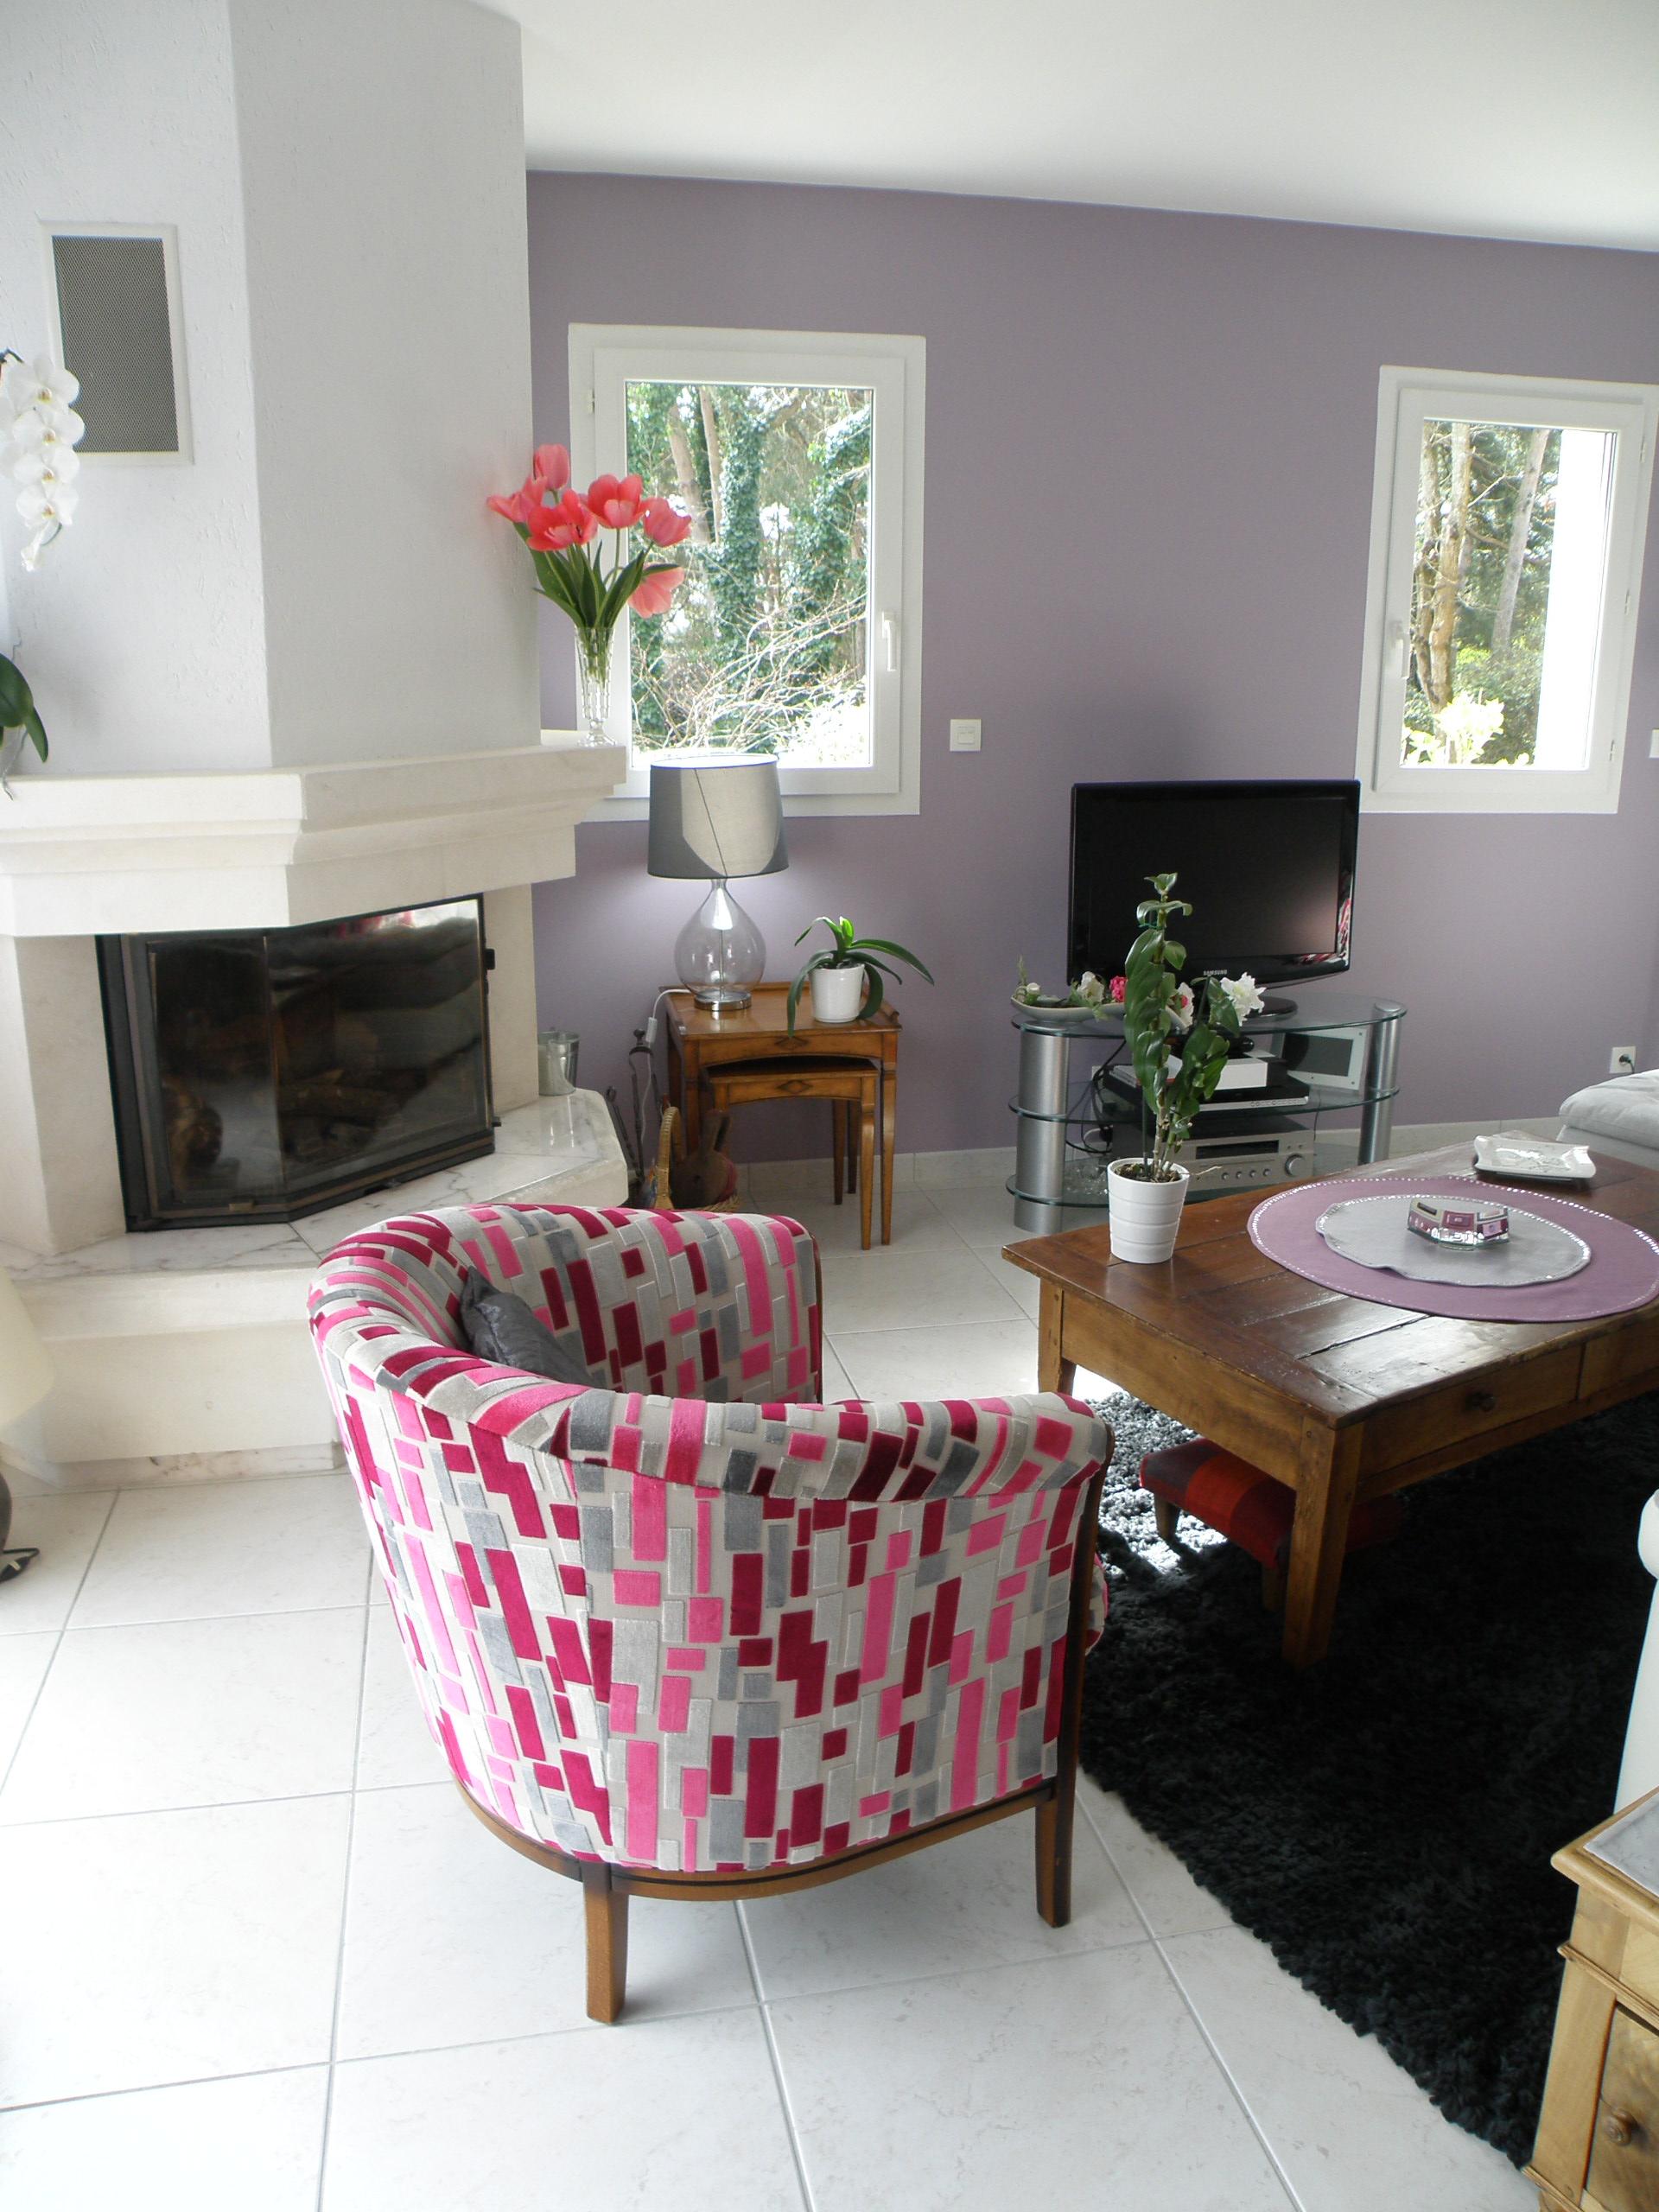 karine meteyer d coration et agencement d 39 int rieur. Black Bedroom Furniture Sets. Home Design Ideas